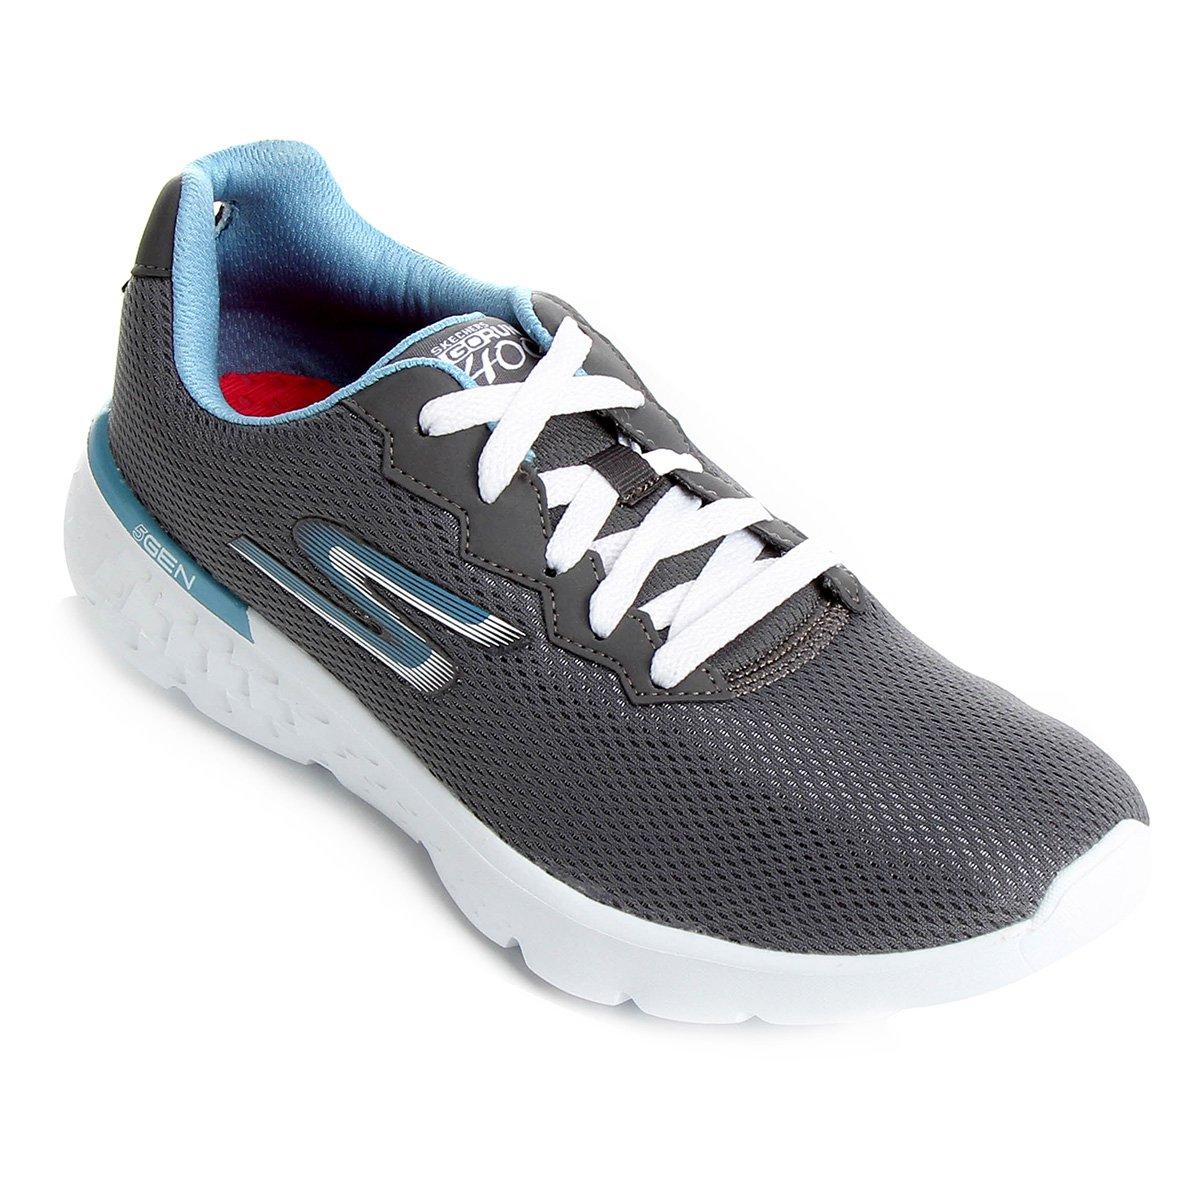 Tênis Skechers Go Agora Run 400 Feminino Compre Agora Go Netsapatos b18975